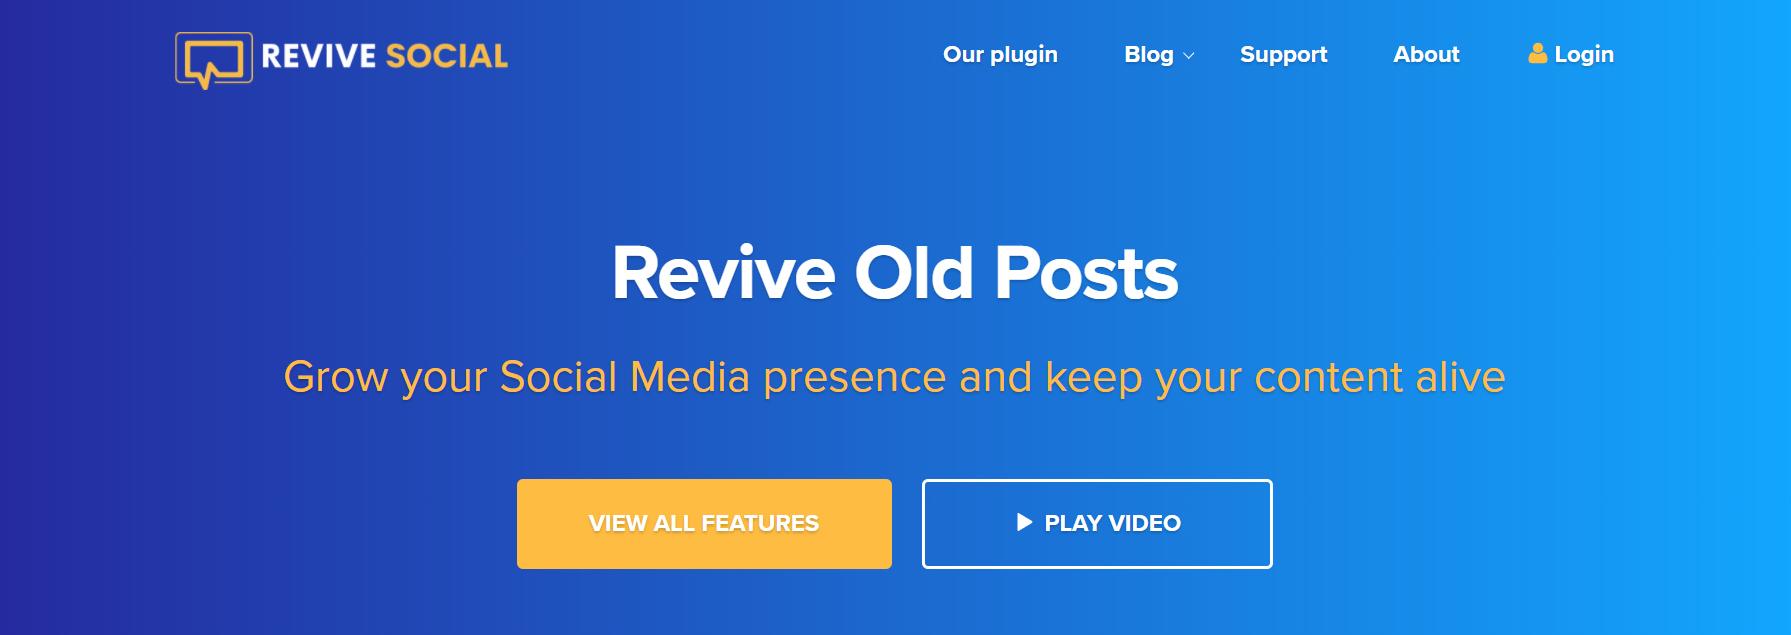 O plugin Revive Old Posts.